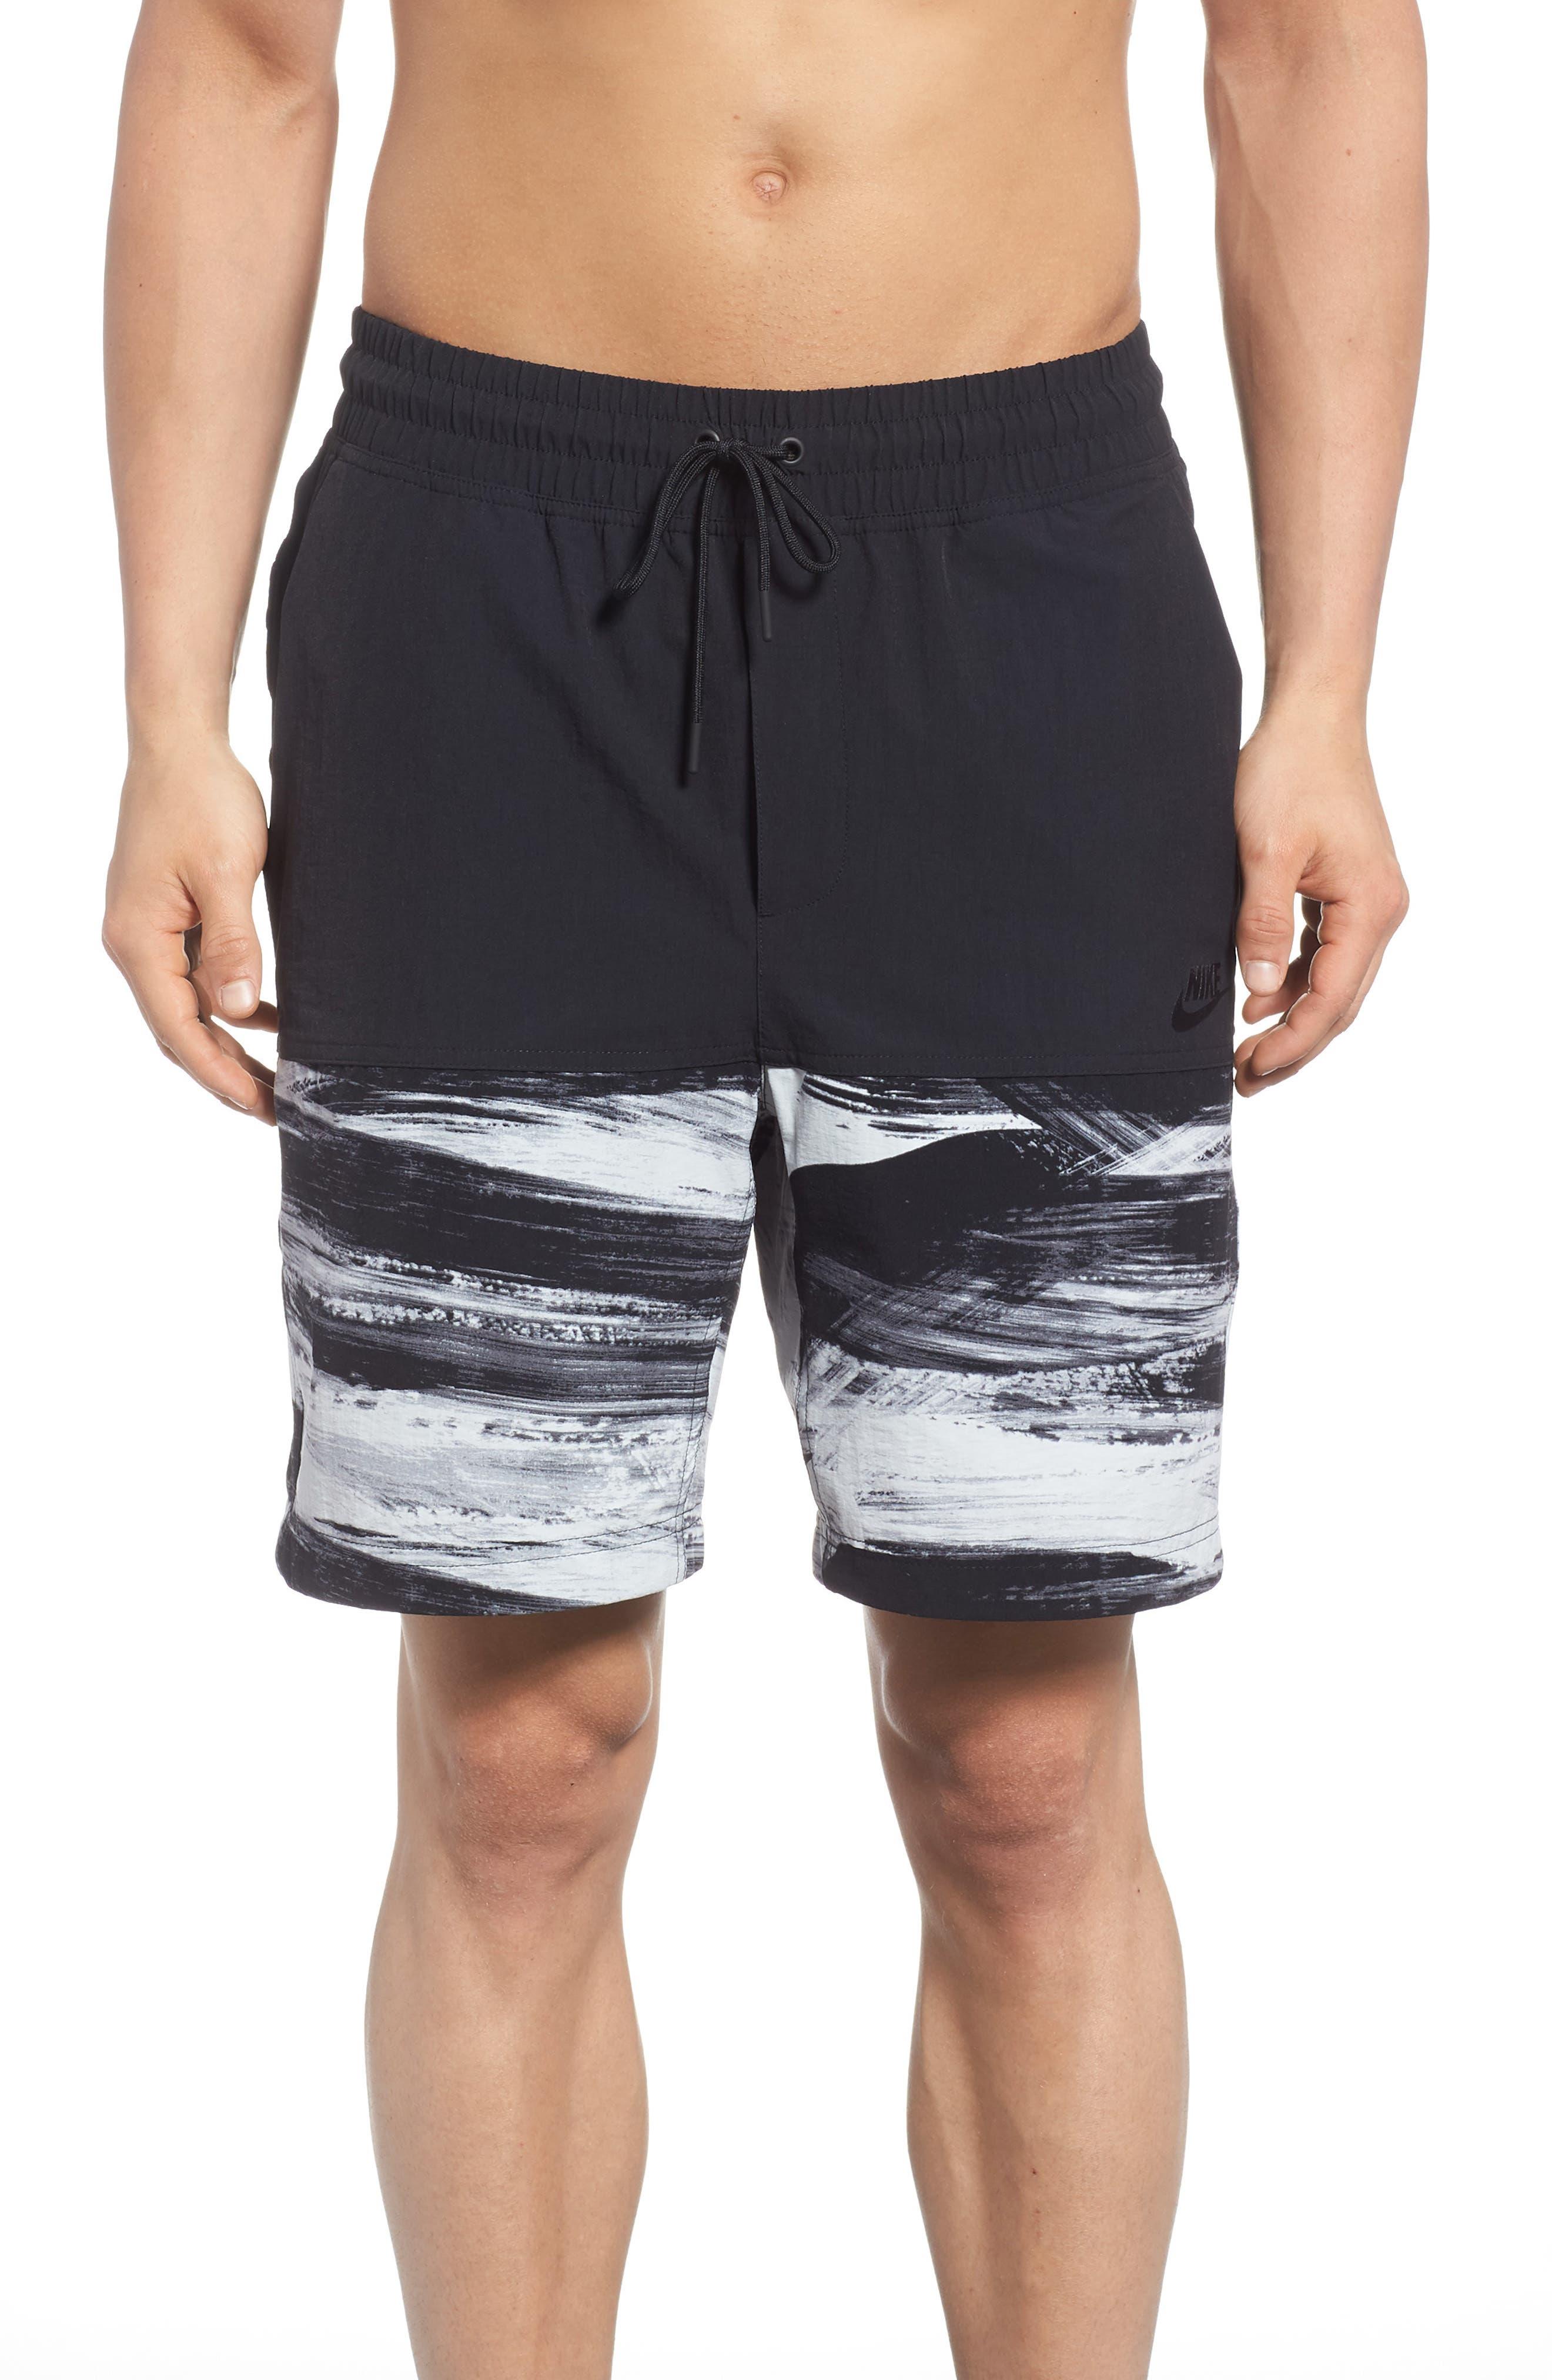 NSW Franchise GX1 Shorts,                         Main,                         color, Black/ Black